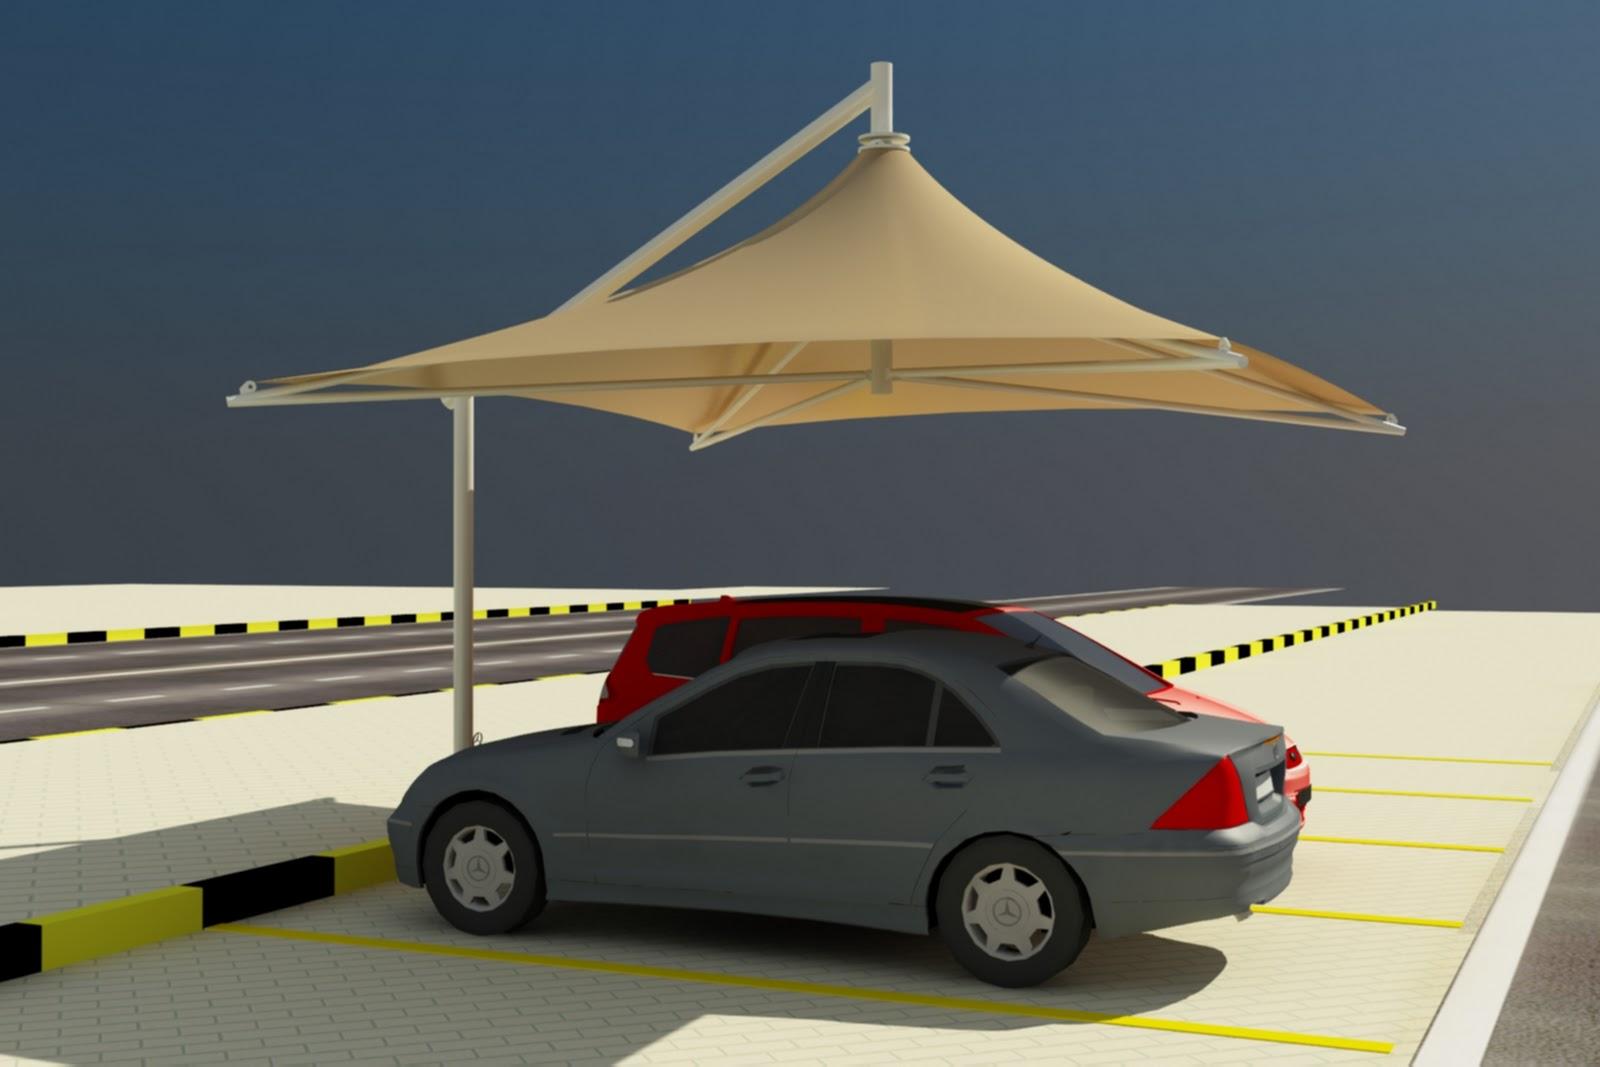 Single Pole Car Parking Shade